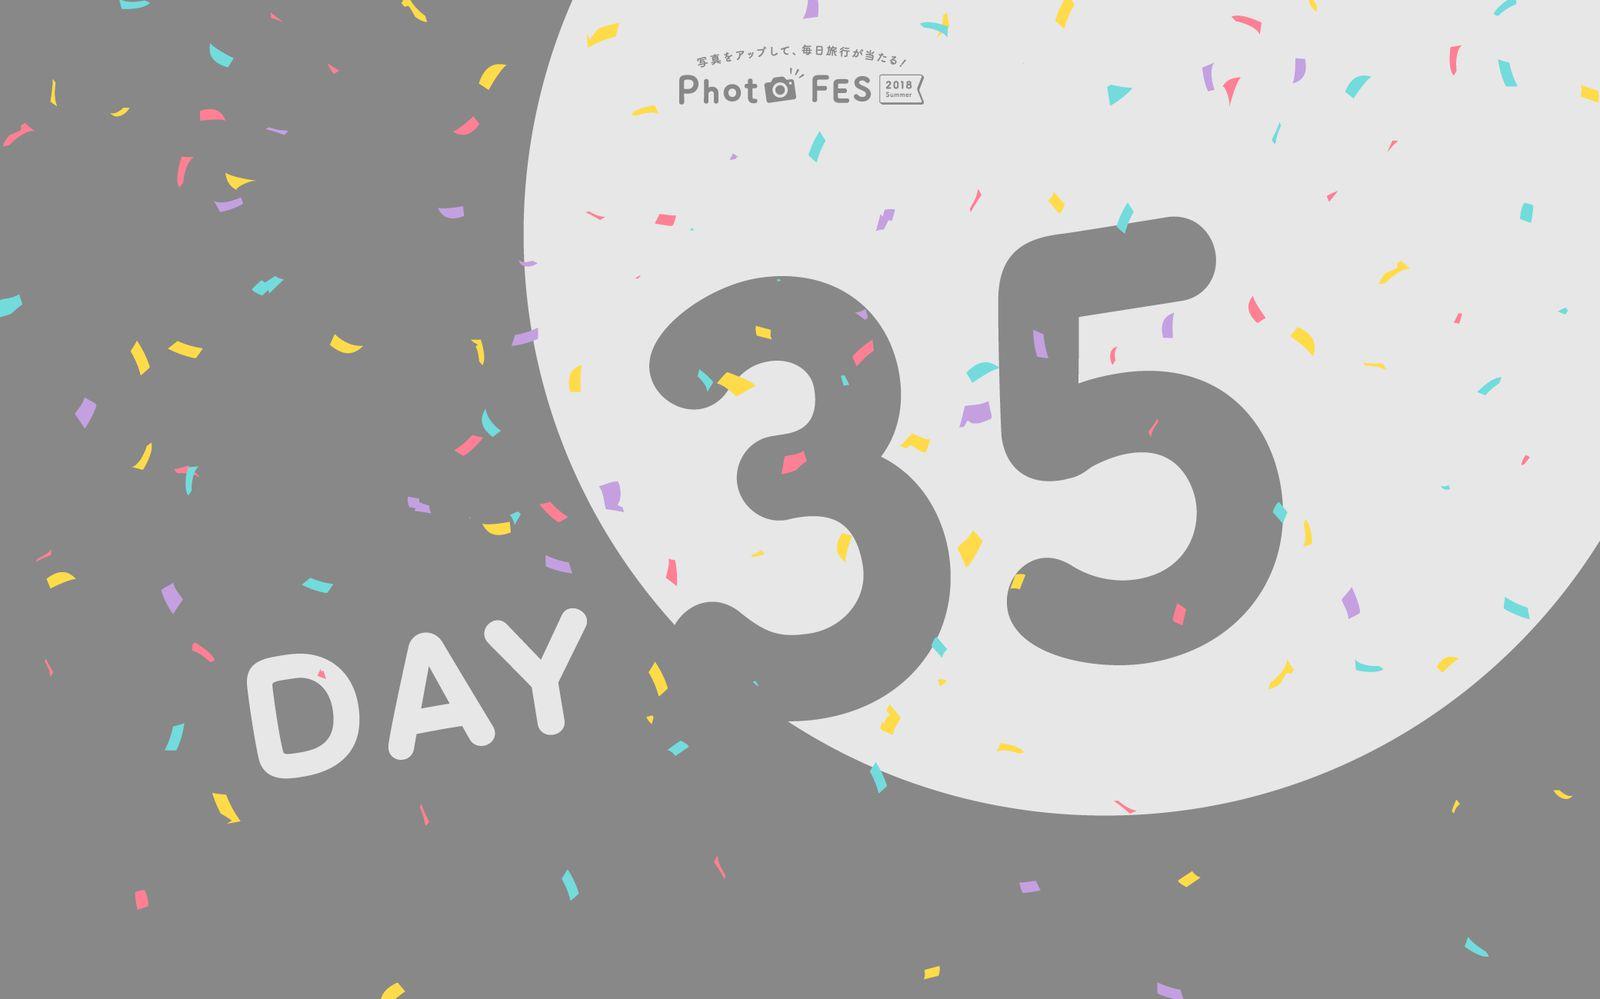 【DAY35】「Photo FES 2018」7月30日投稿分であたる賞品&受賞者発表